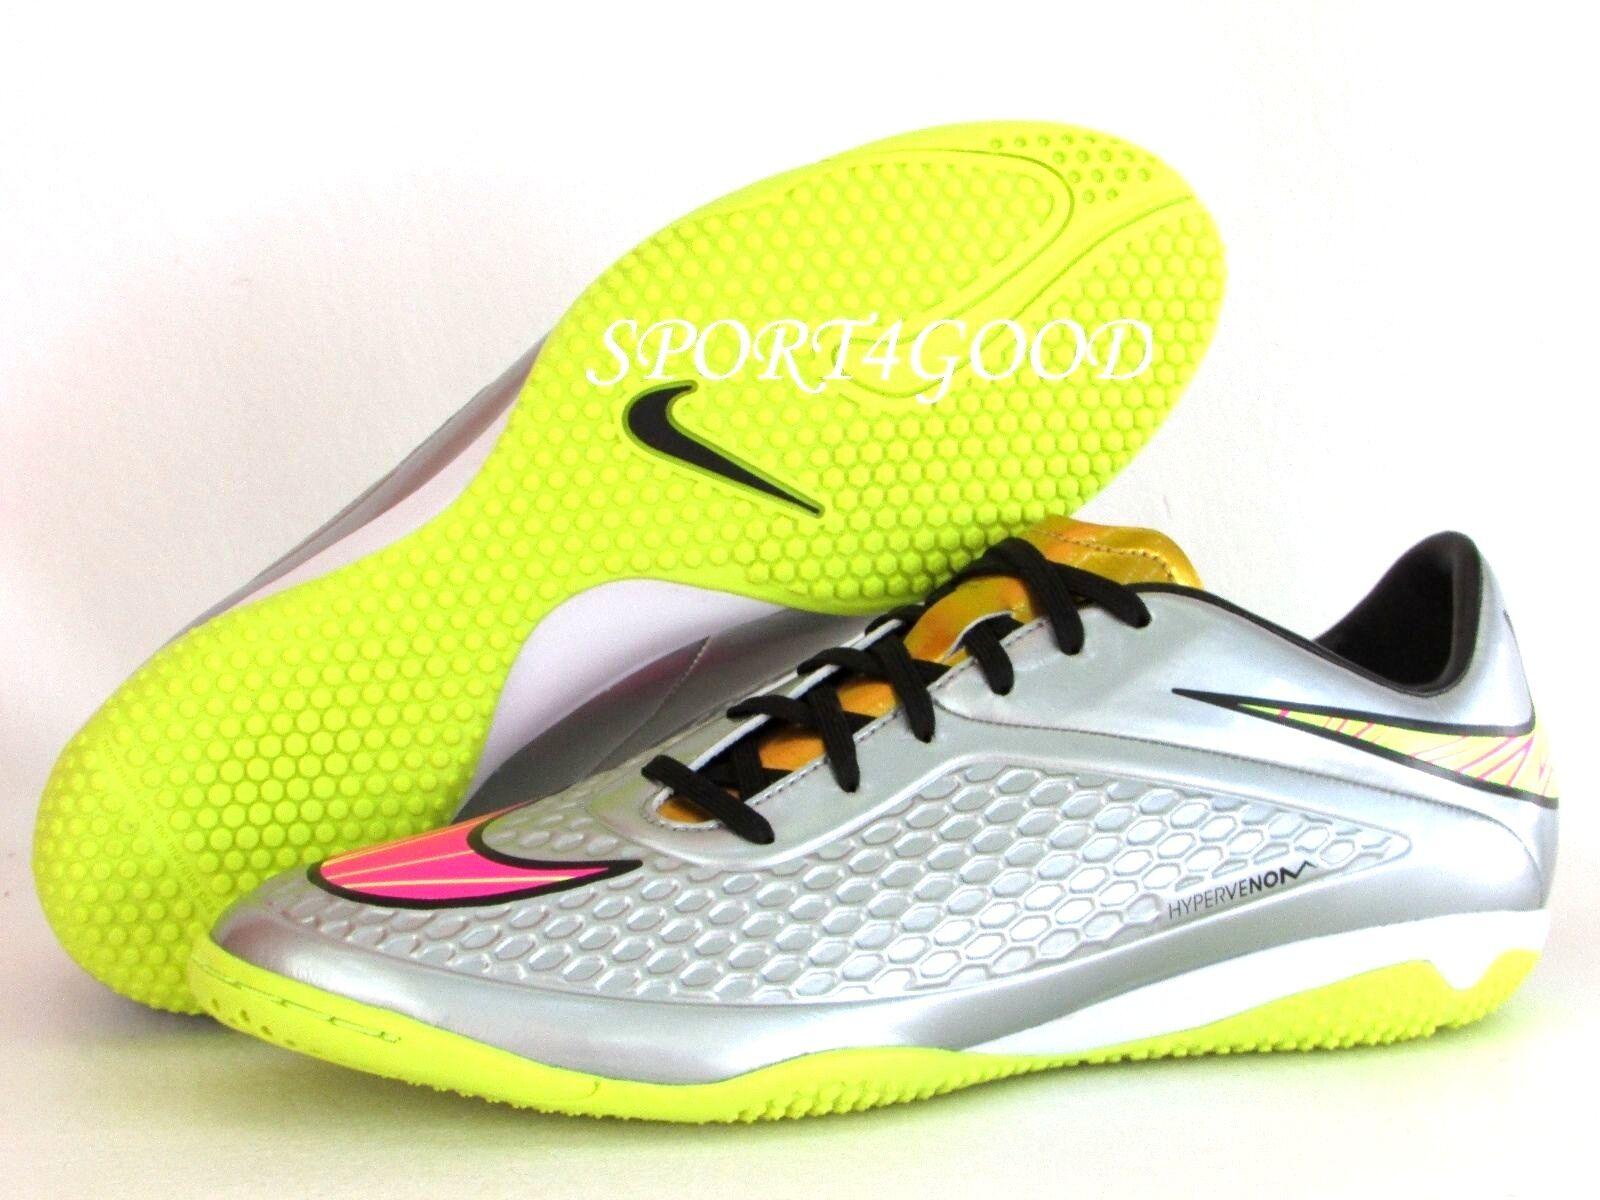 4586f88e5 Nike Hypervenom Phelon Premium Turf Mens 677588-069 Chrome Soccer ...